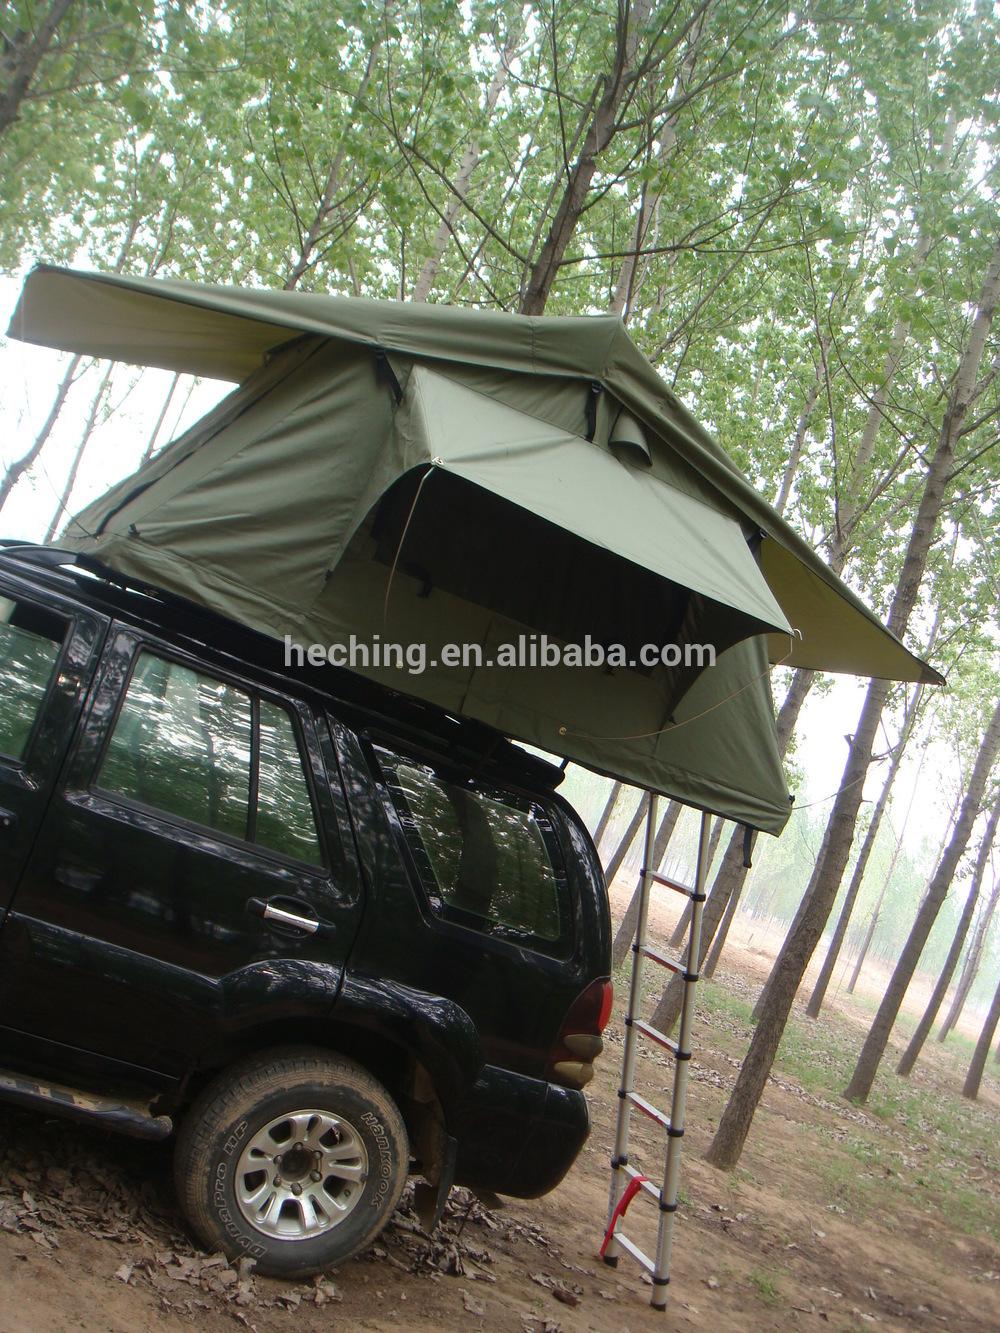 4x4 aksesuar karavan kamp römork/offroad karavan römork